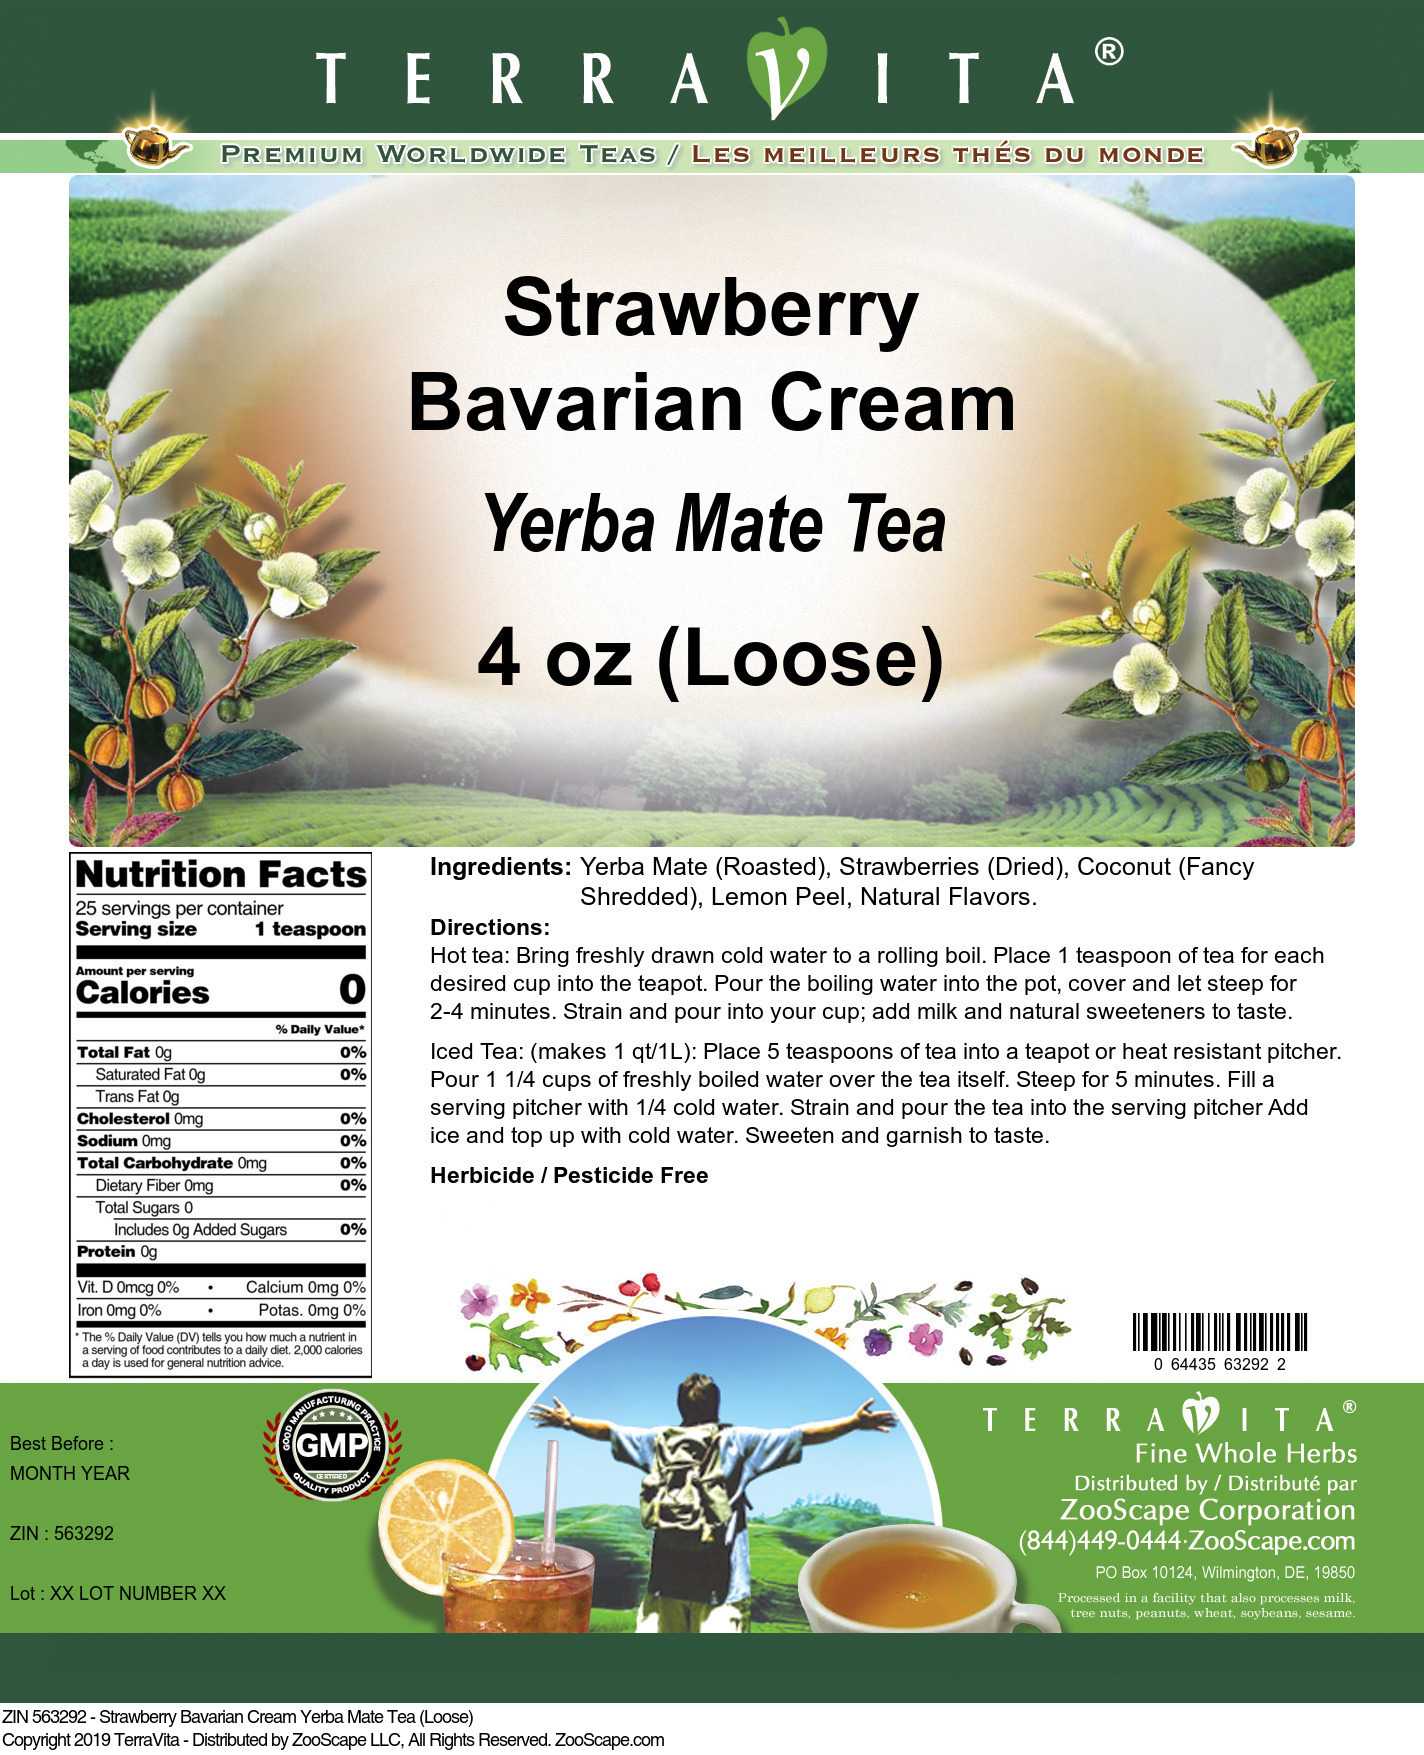 Strawberry Bavarian Cream Yerba Mate Tea (Loose)